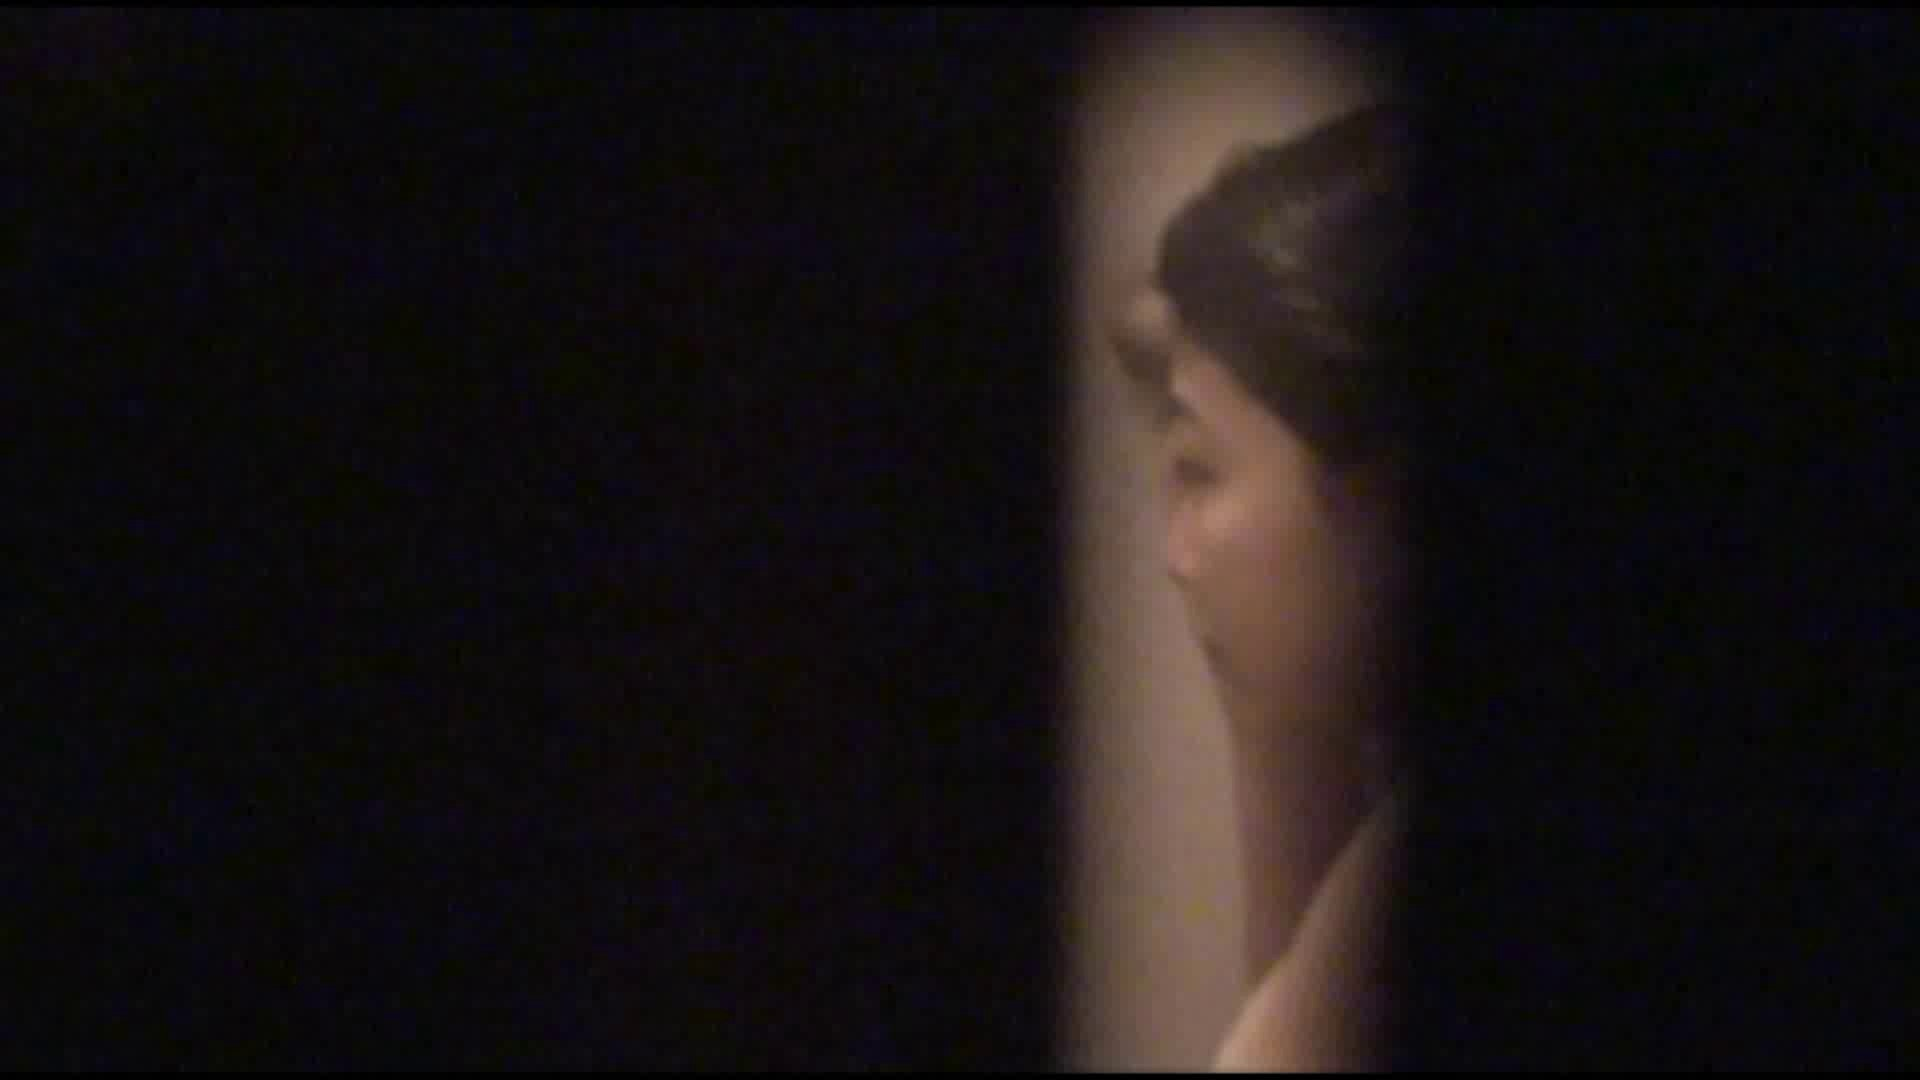 vol.05最高の極上美人!可愛い彼女の裸体をどうぞ!風呂上り鏡チェックも必見! 美人  99PIX 46